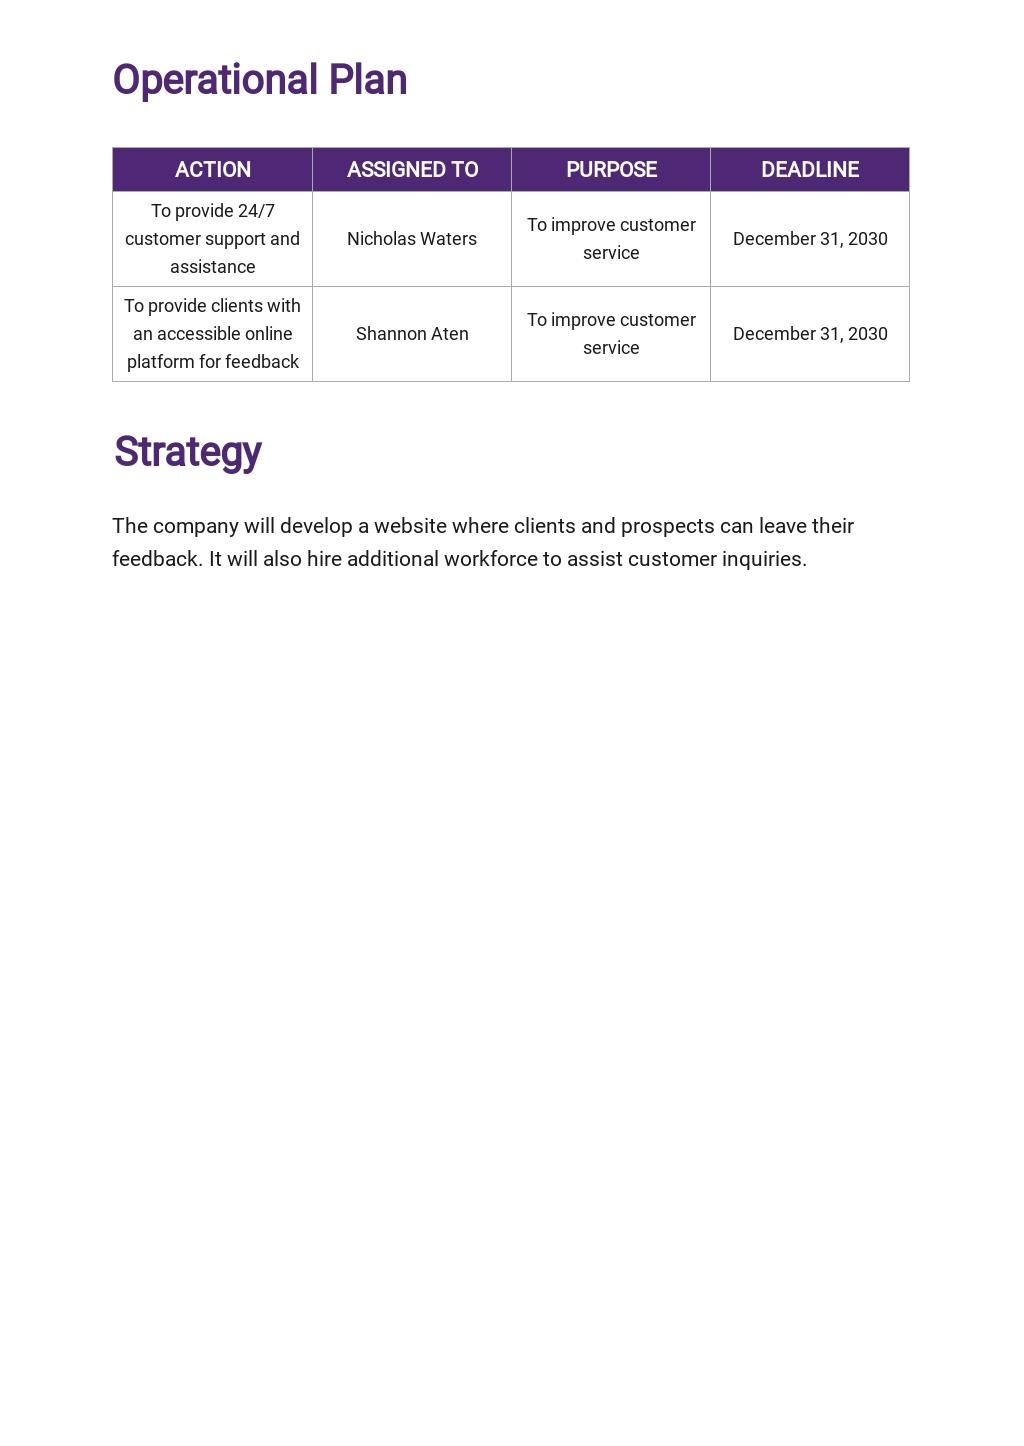 Customer Service Operational Plan Template 2.jpe